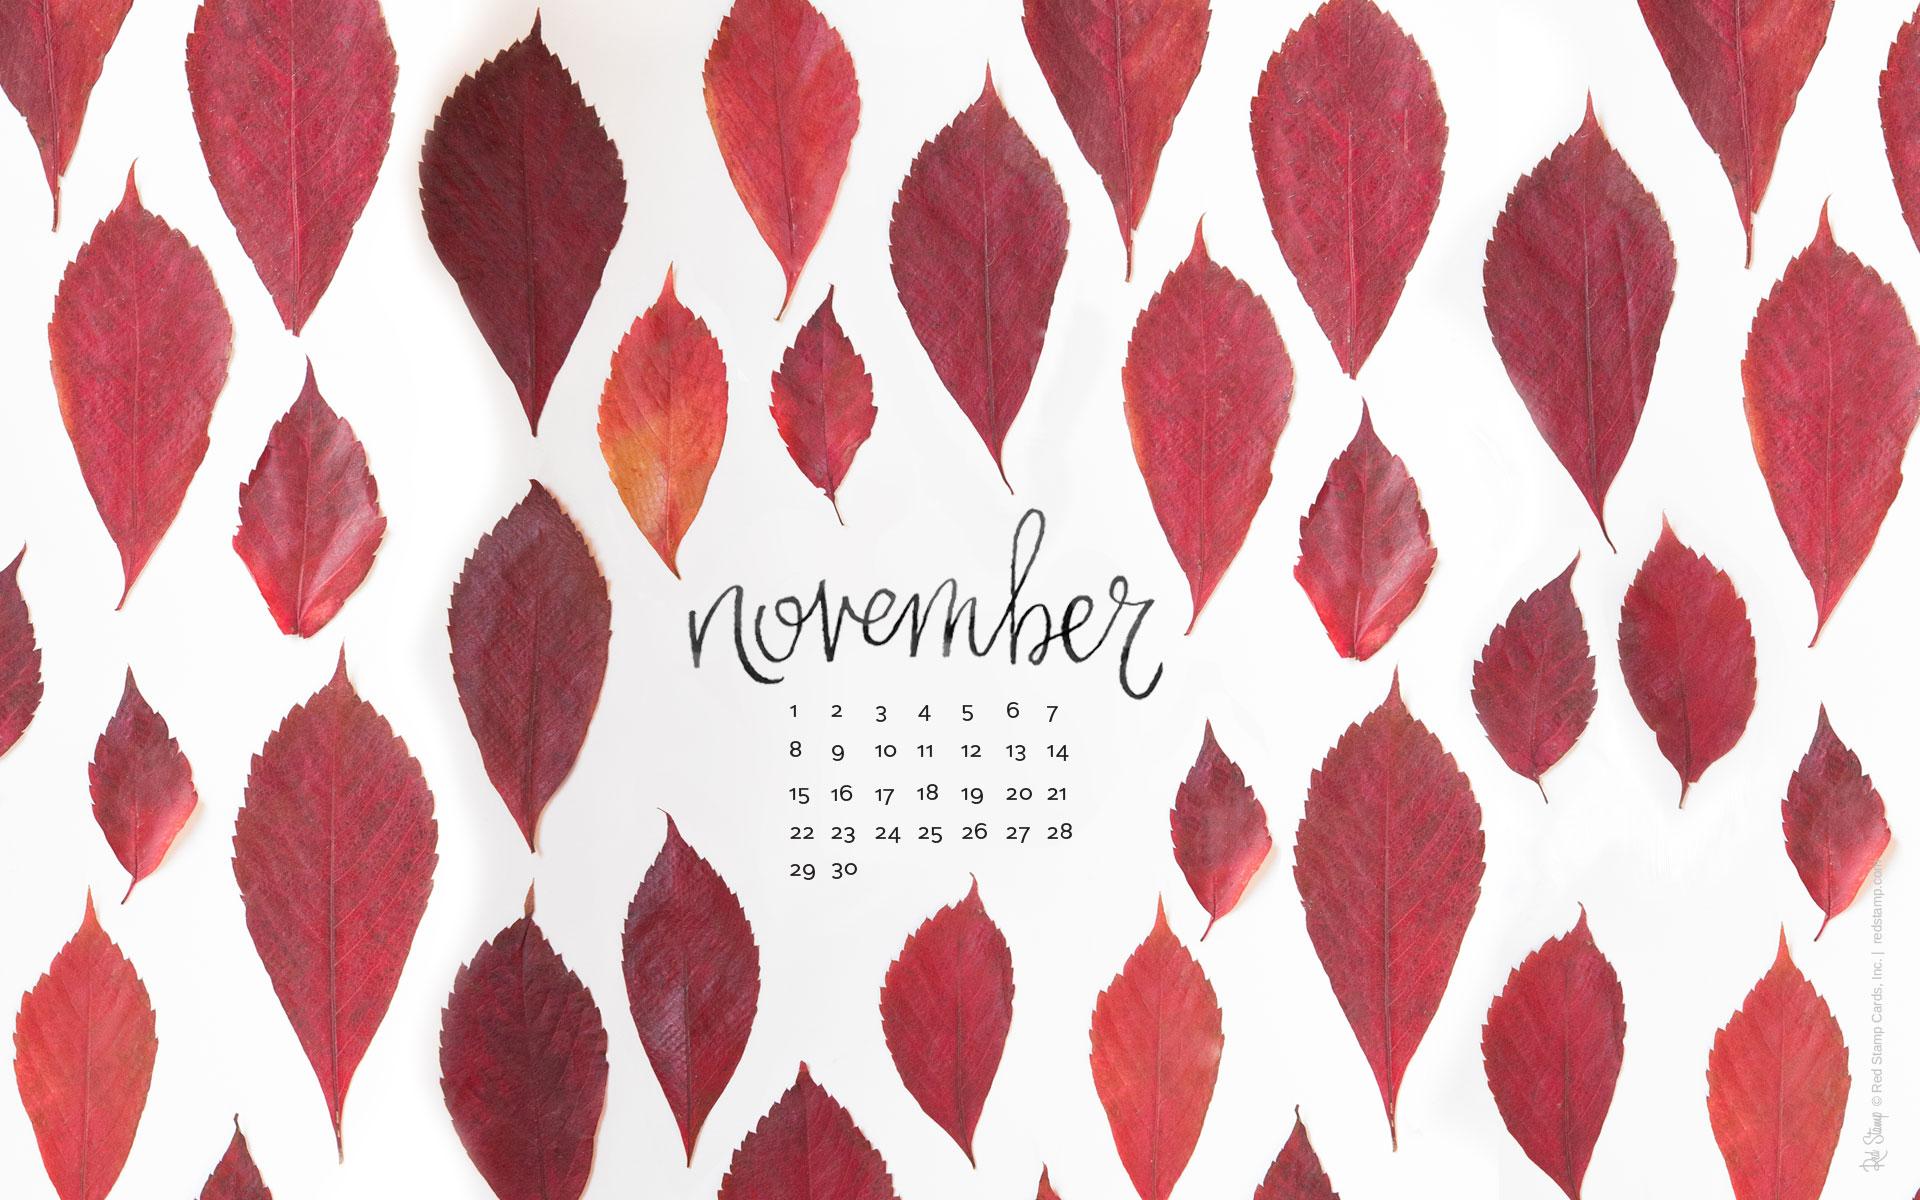 Computerkleider - Free Desktop Wallpaper im November ...